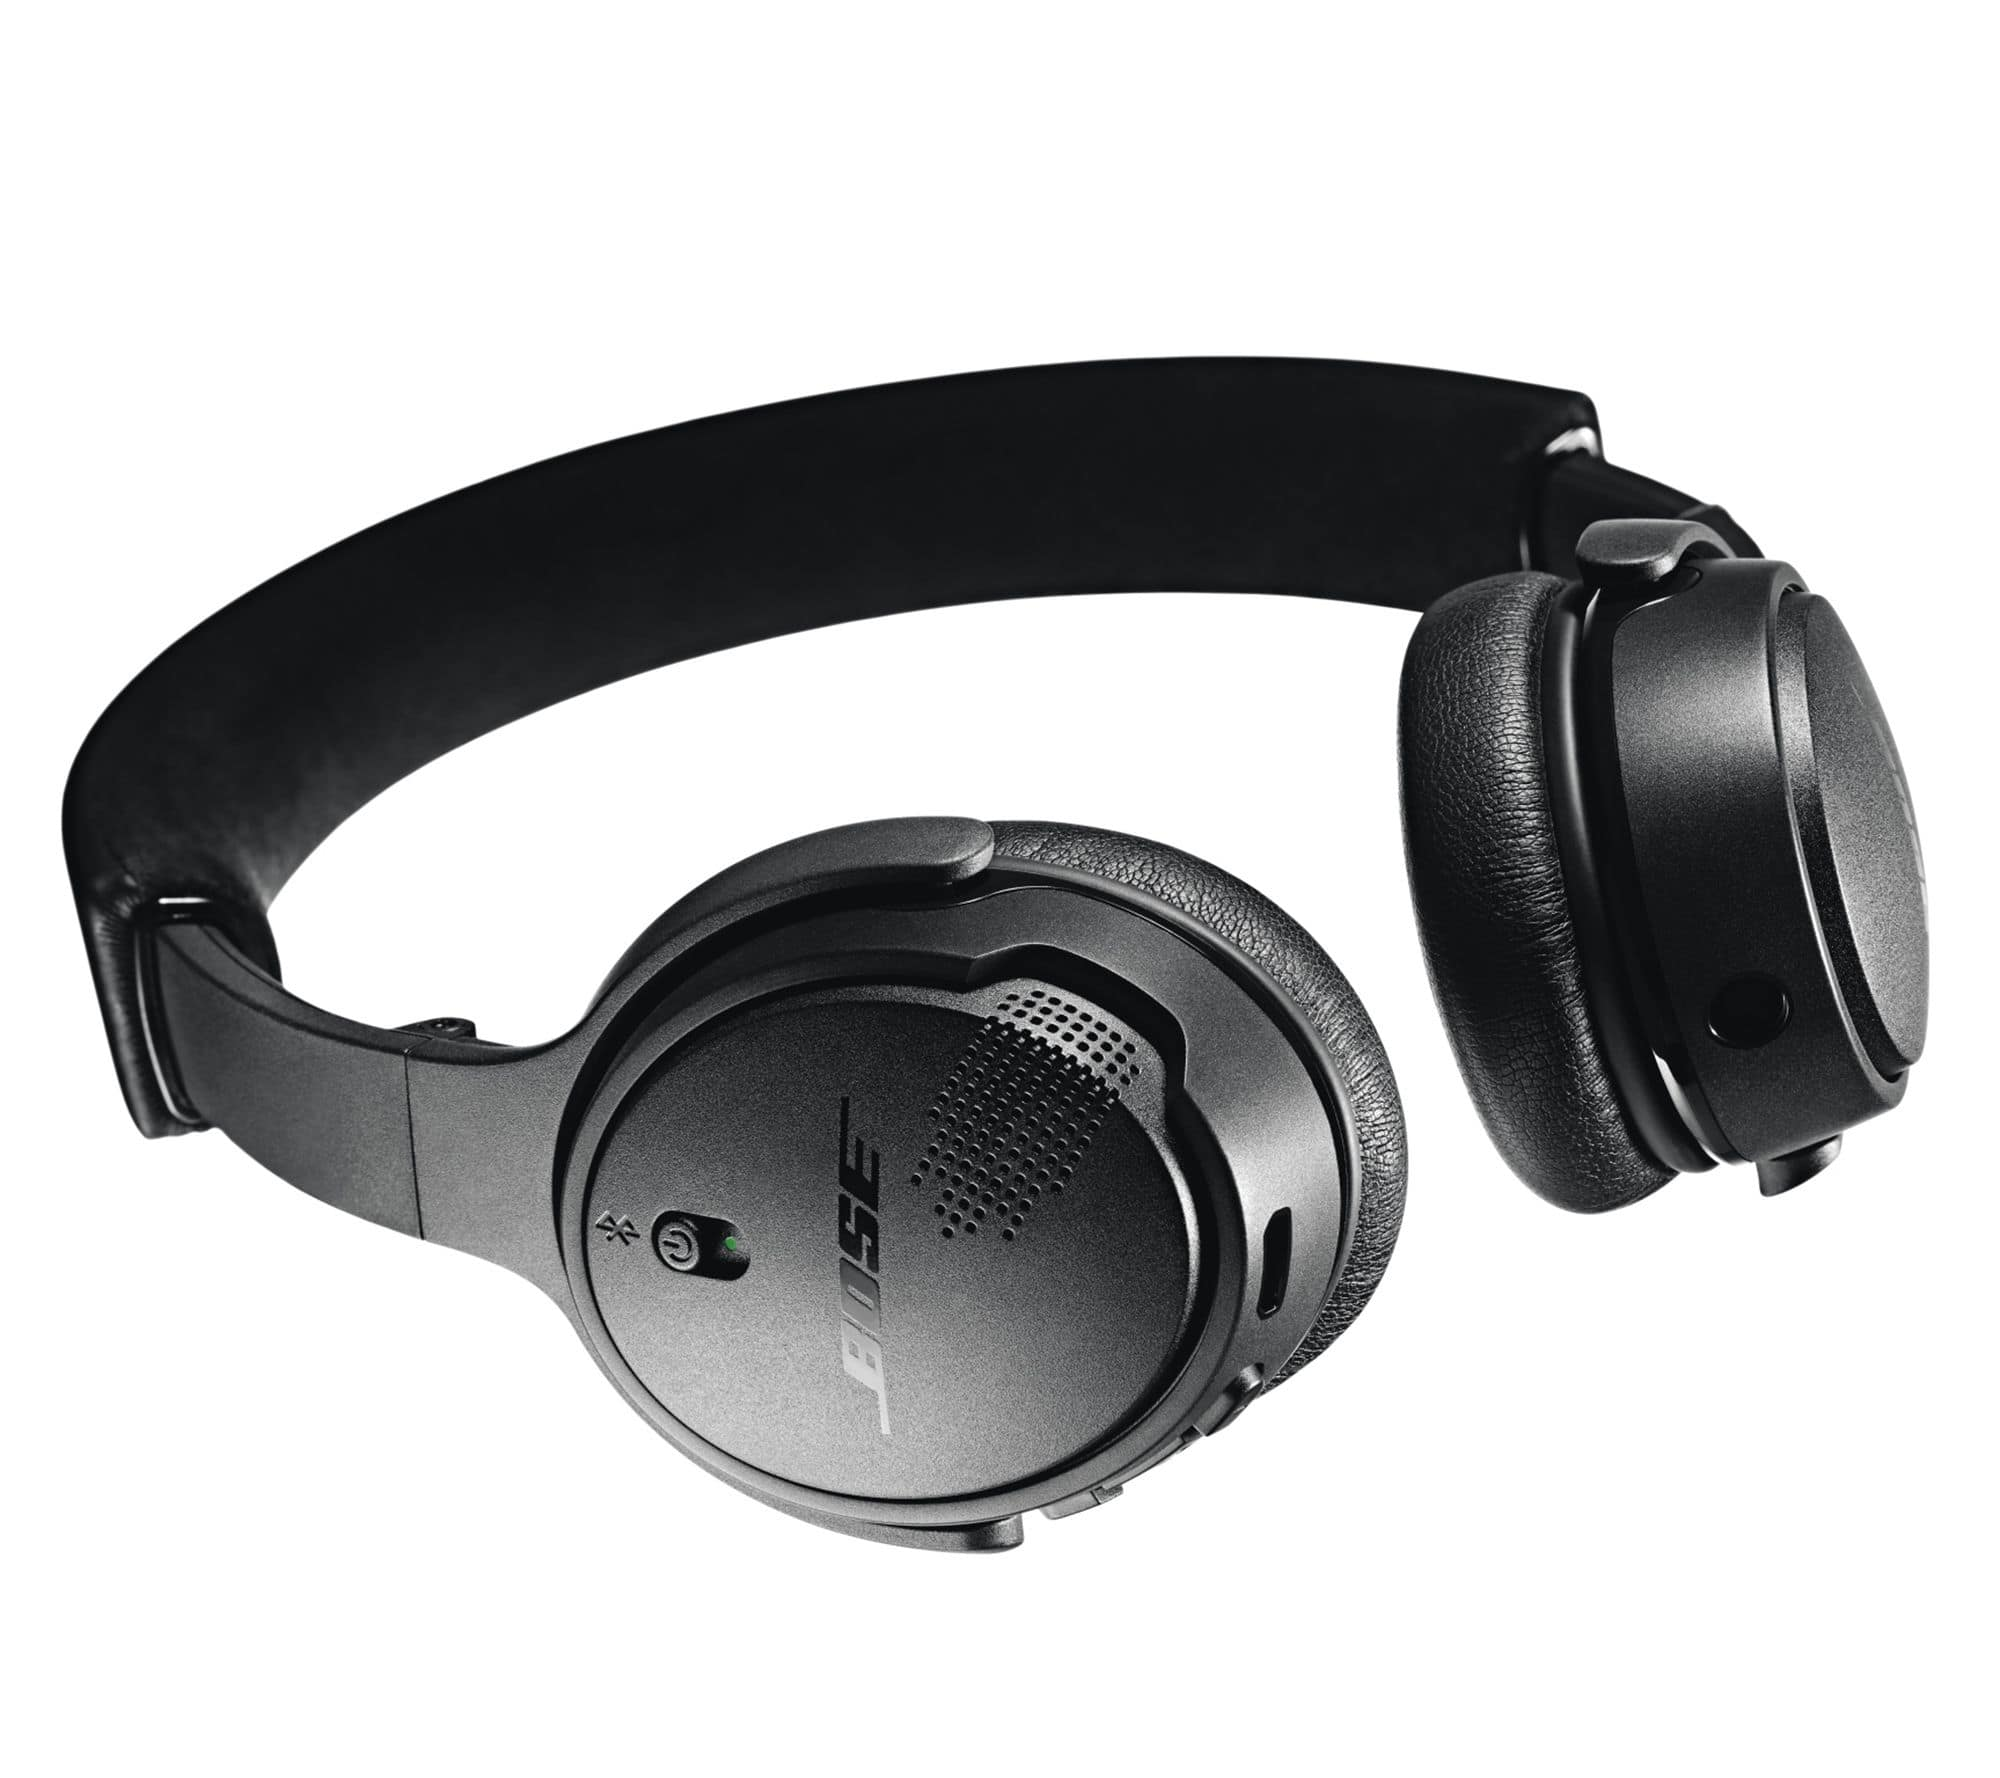 Bose On-Ear Wireless Bluetooth Headphones $99.96